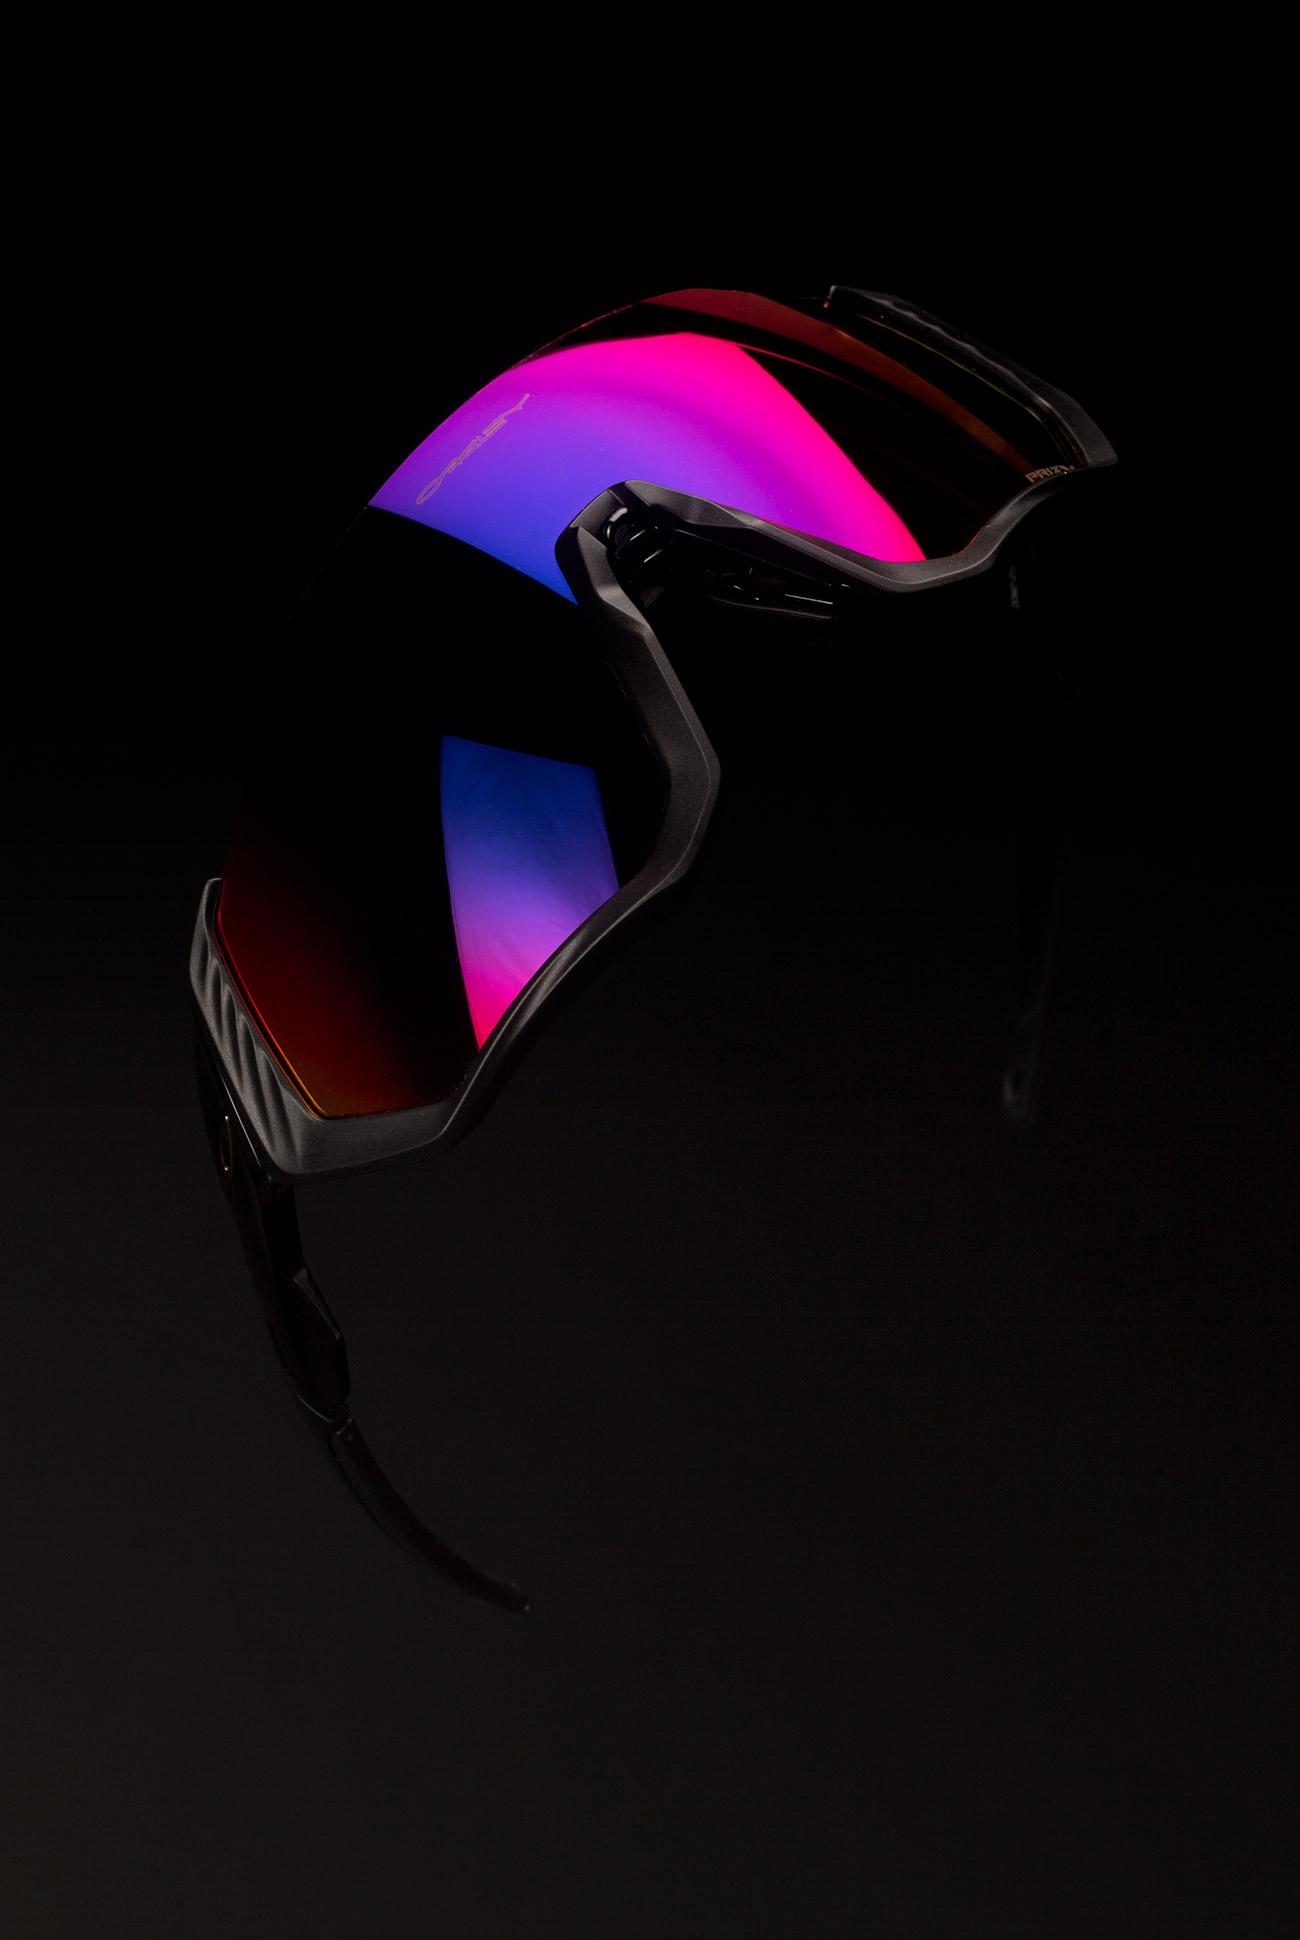 515e012ca39 Exclusive oakleys newest sunglasses are innovative jpg 1300x1940 Oakley  exclusive